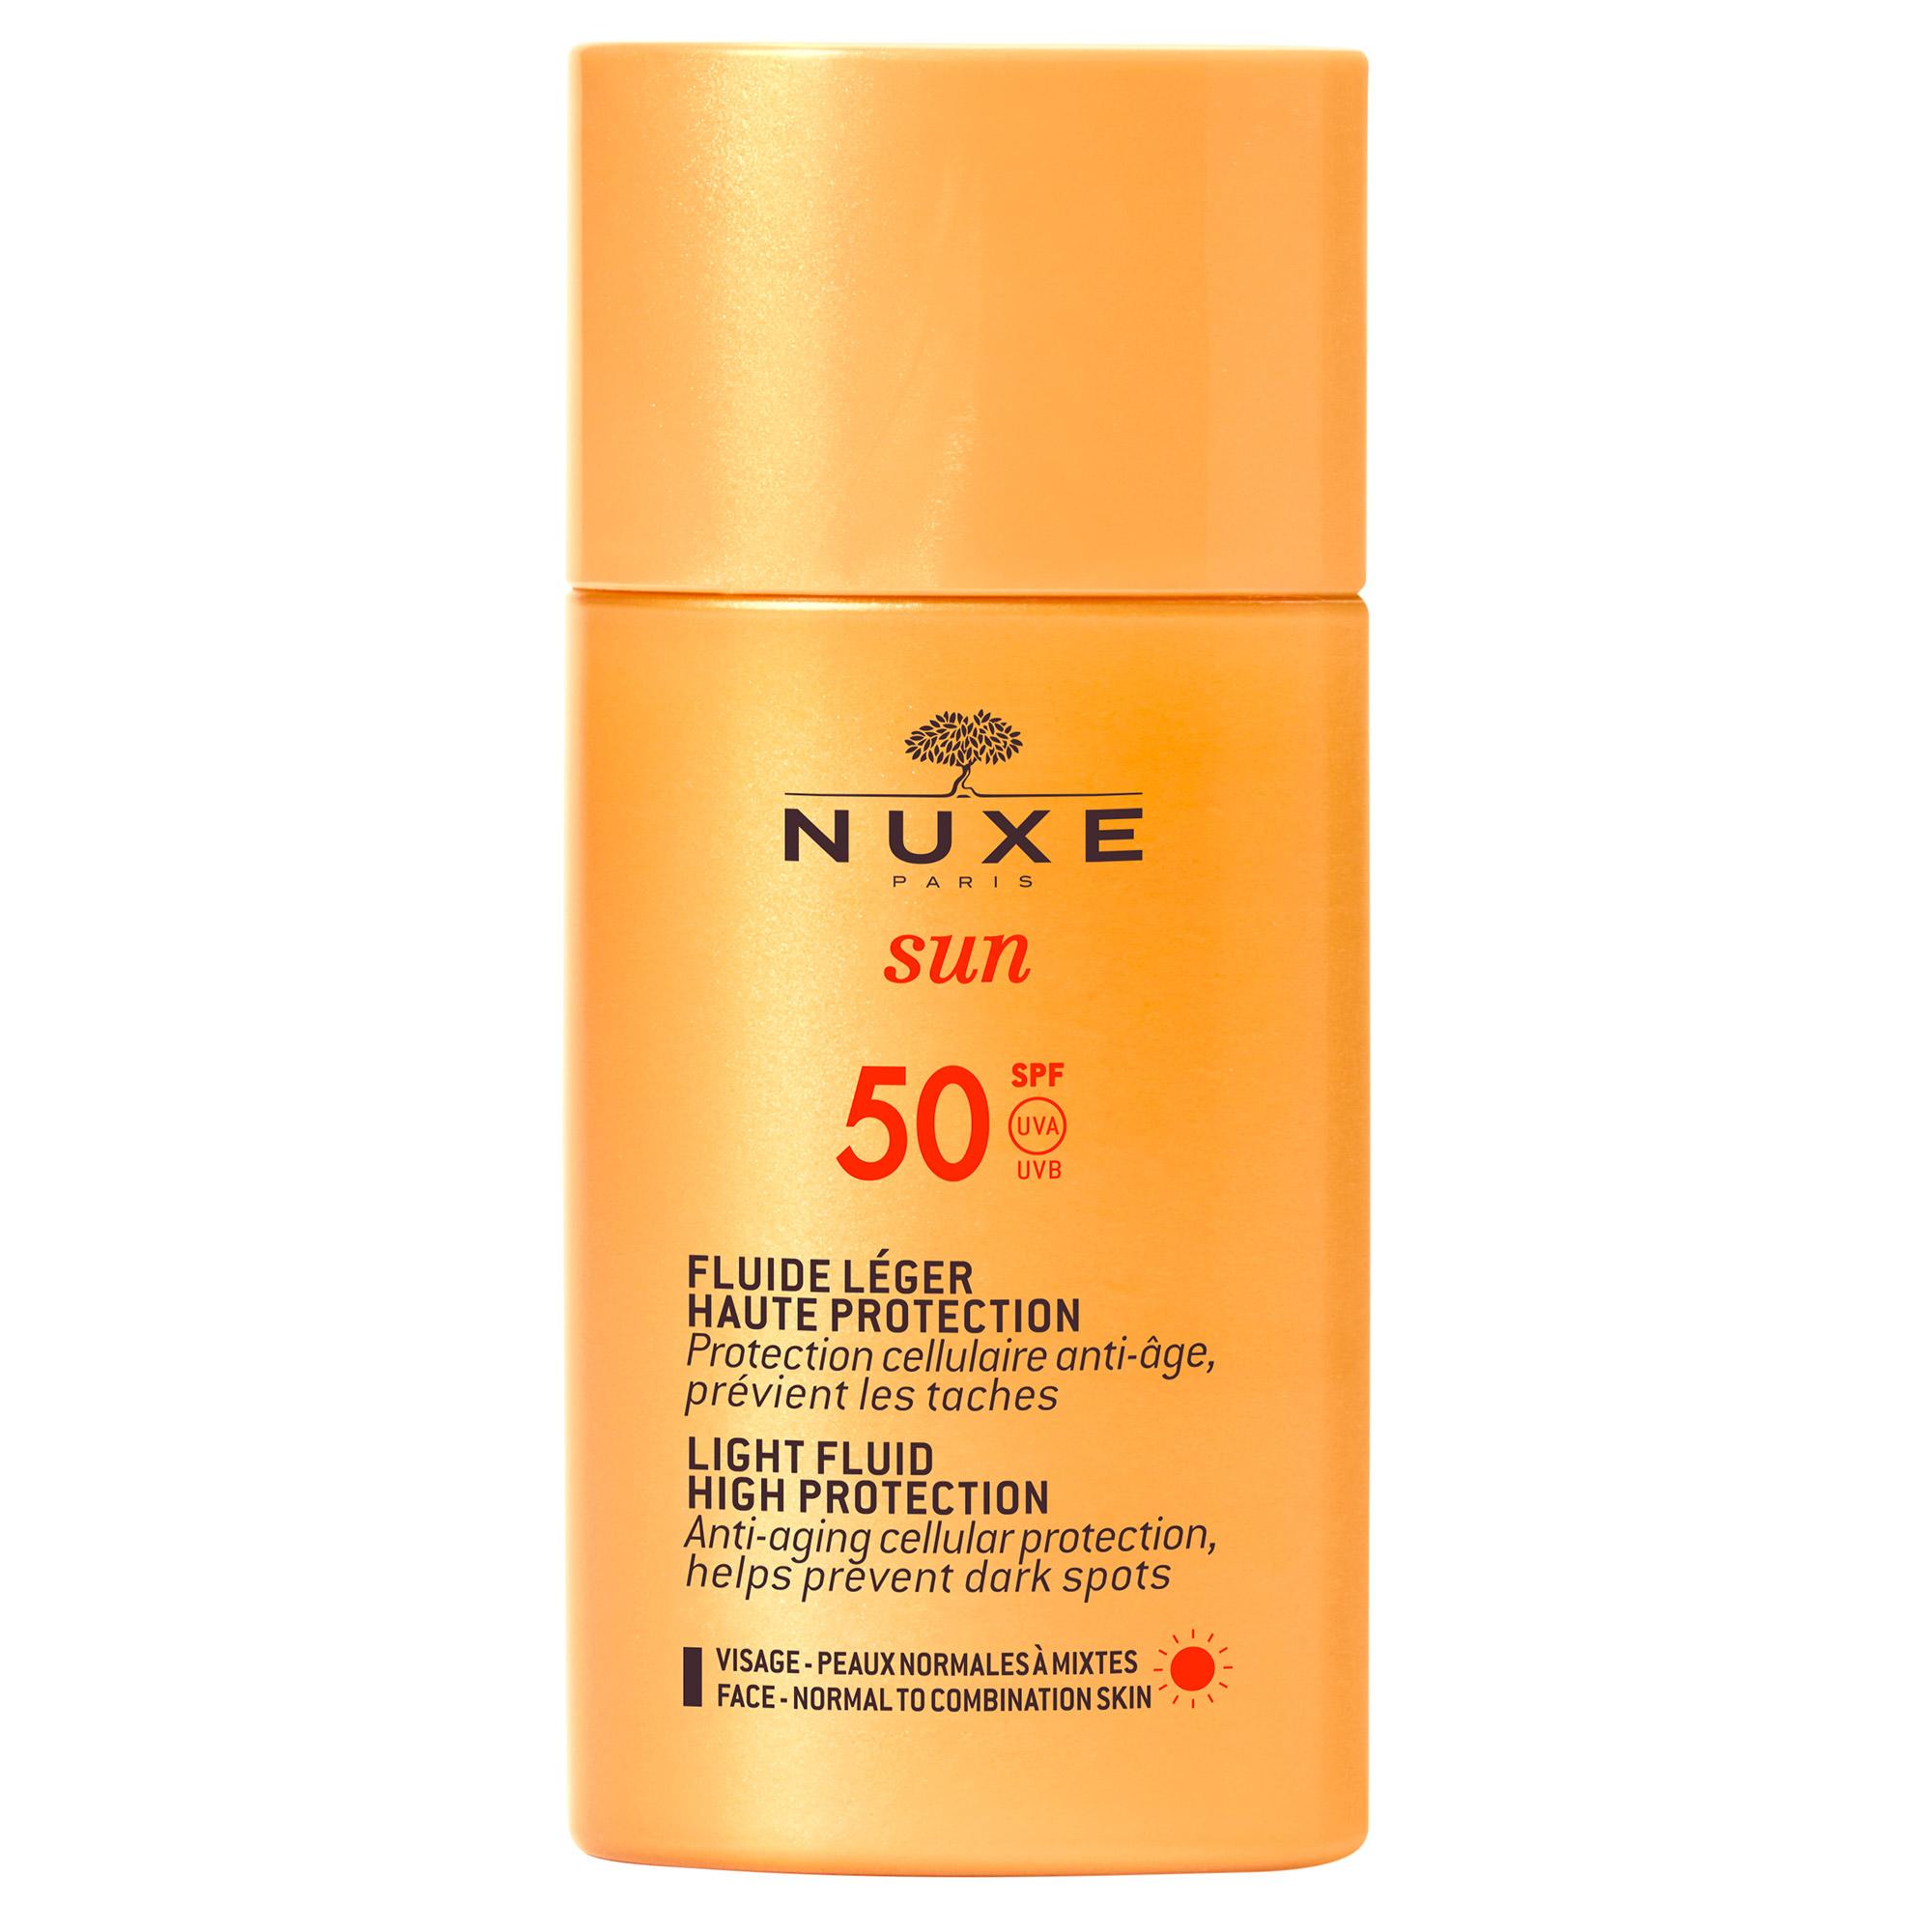 Nuxe Sun SPF50 Light Fluid High Protection SPF50 50ml